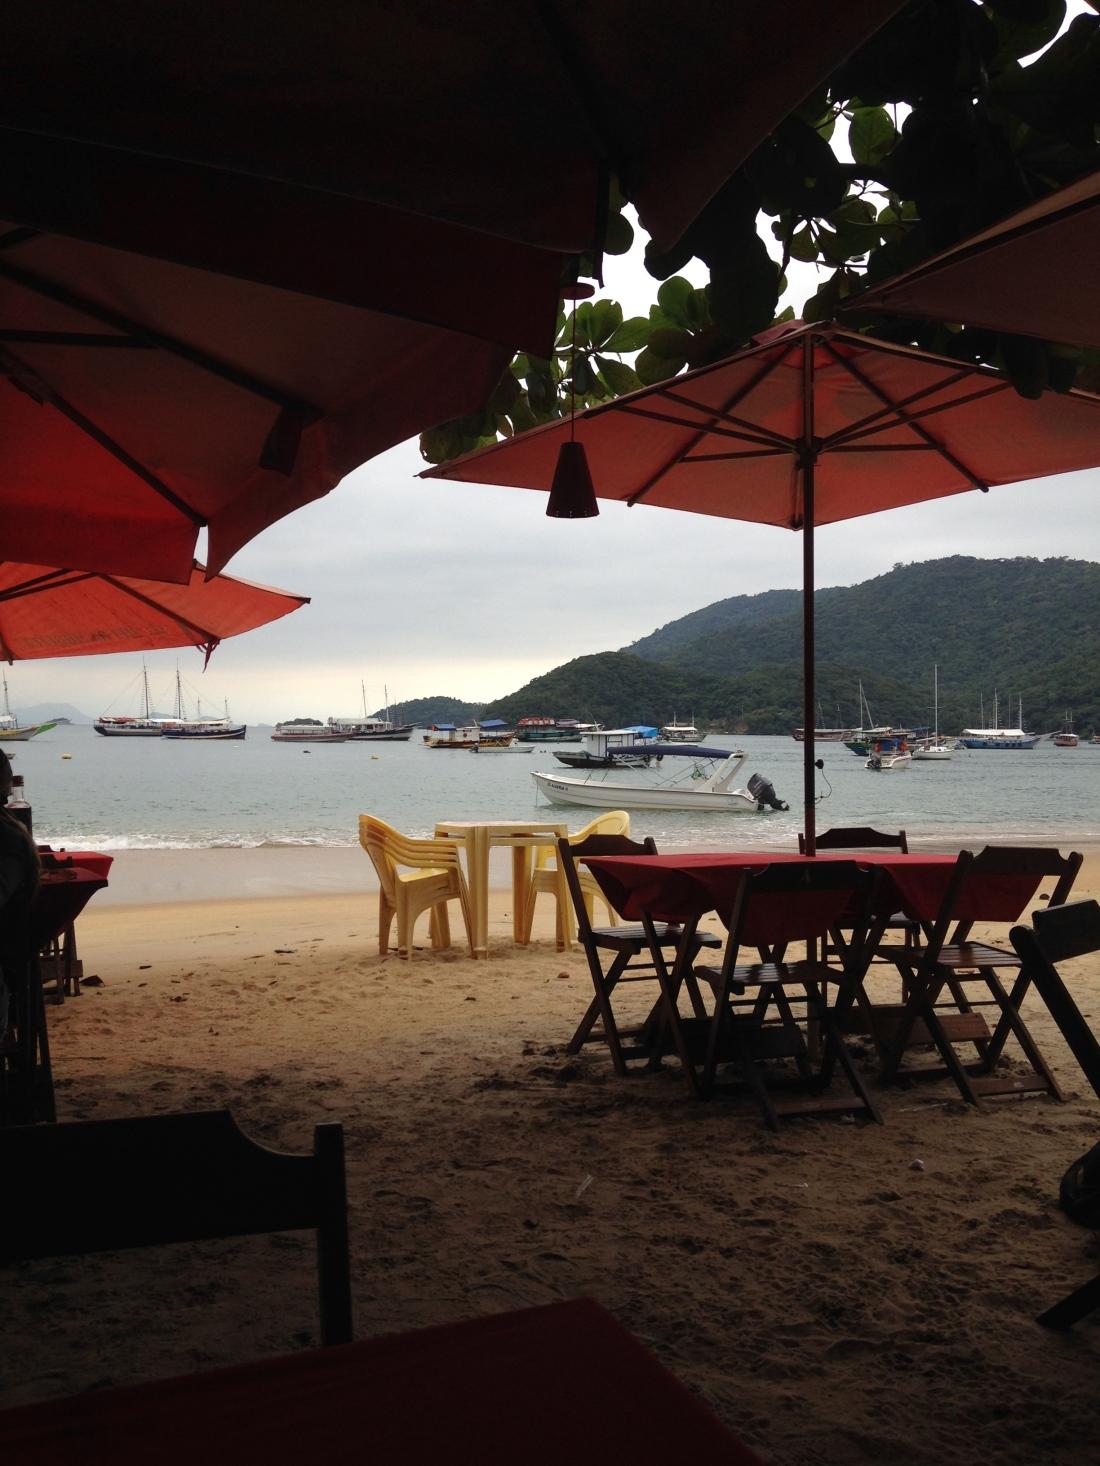 ilha-grande-rj-viagem-blog-coamotta-10